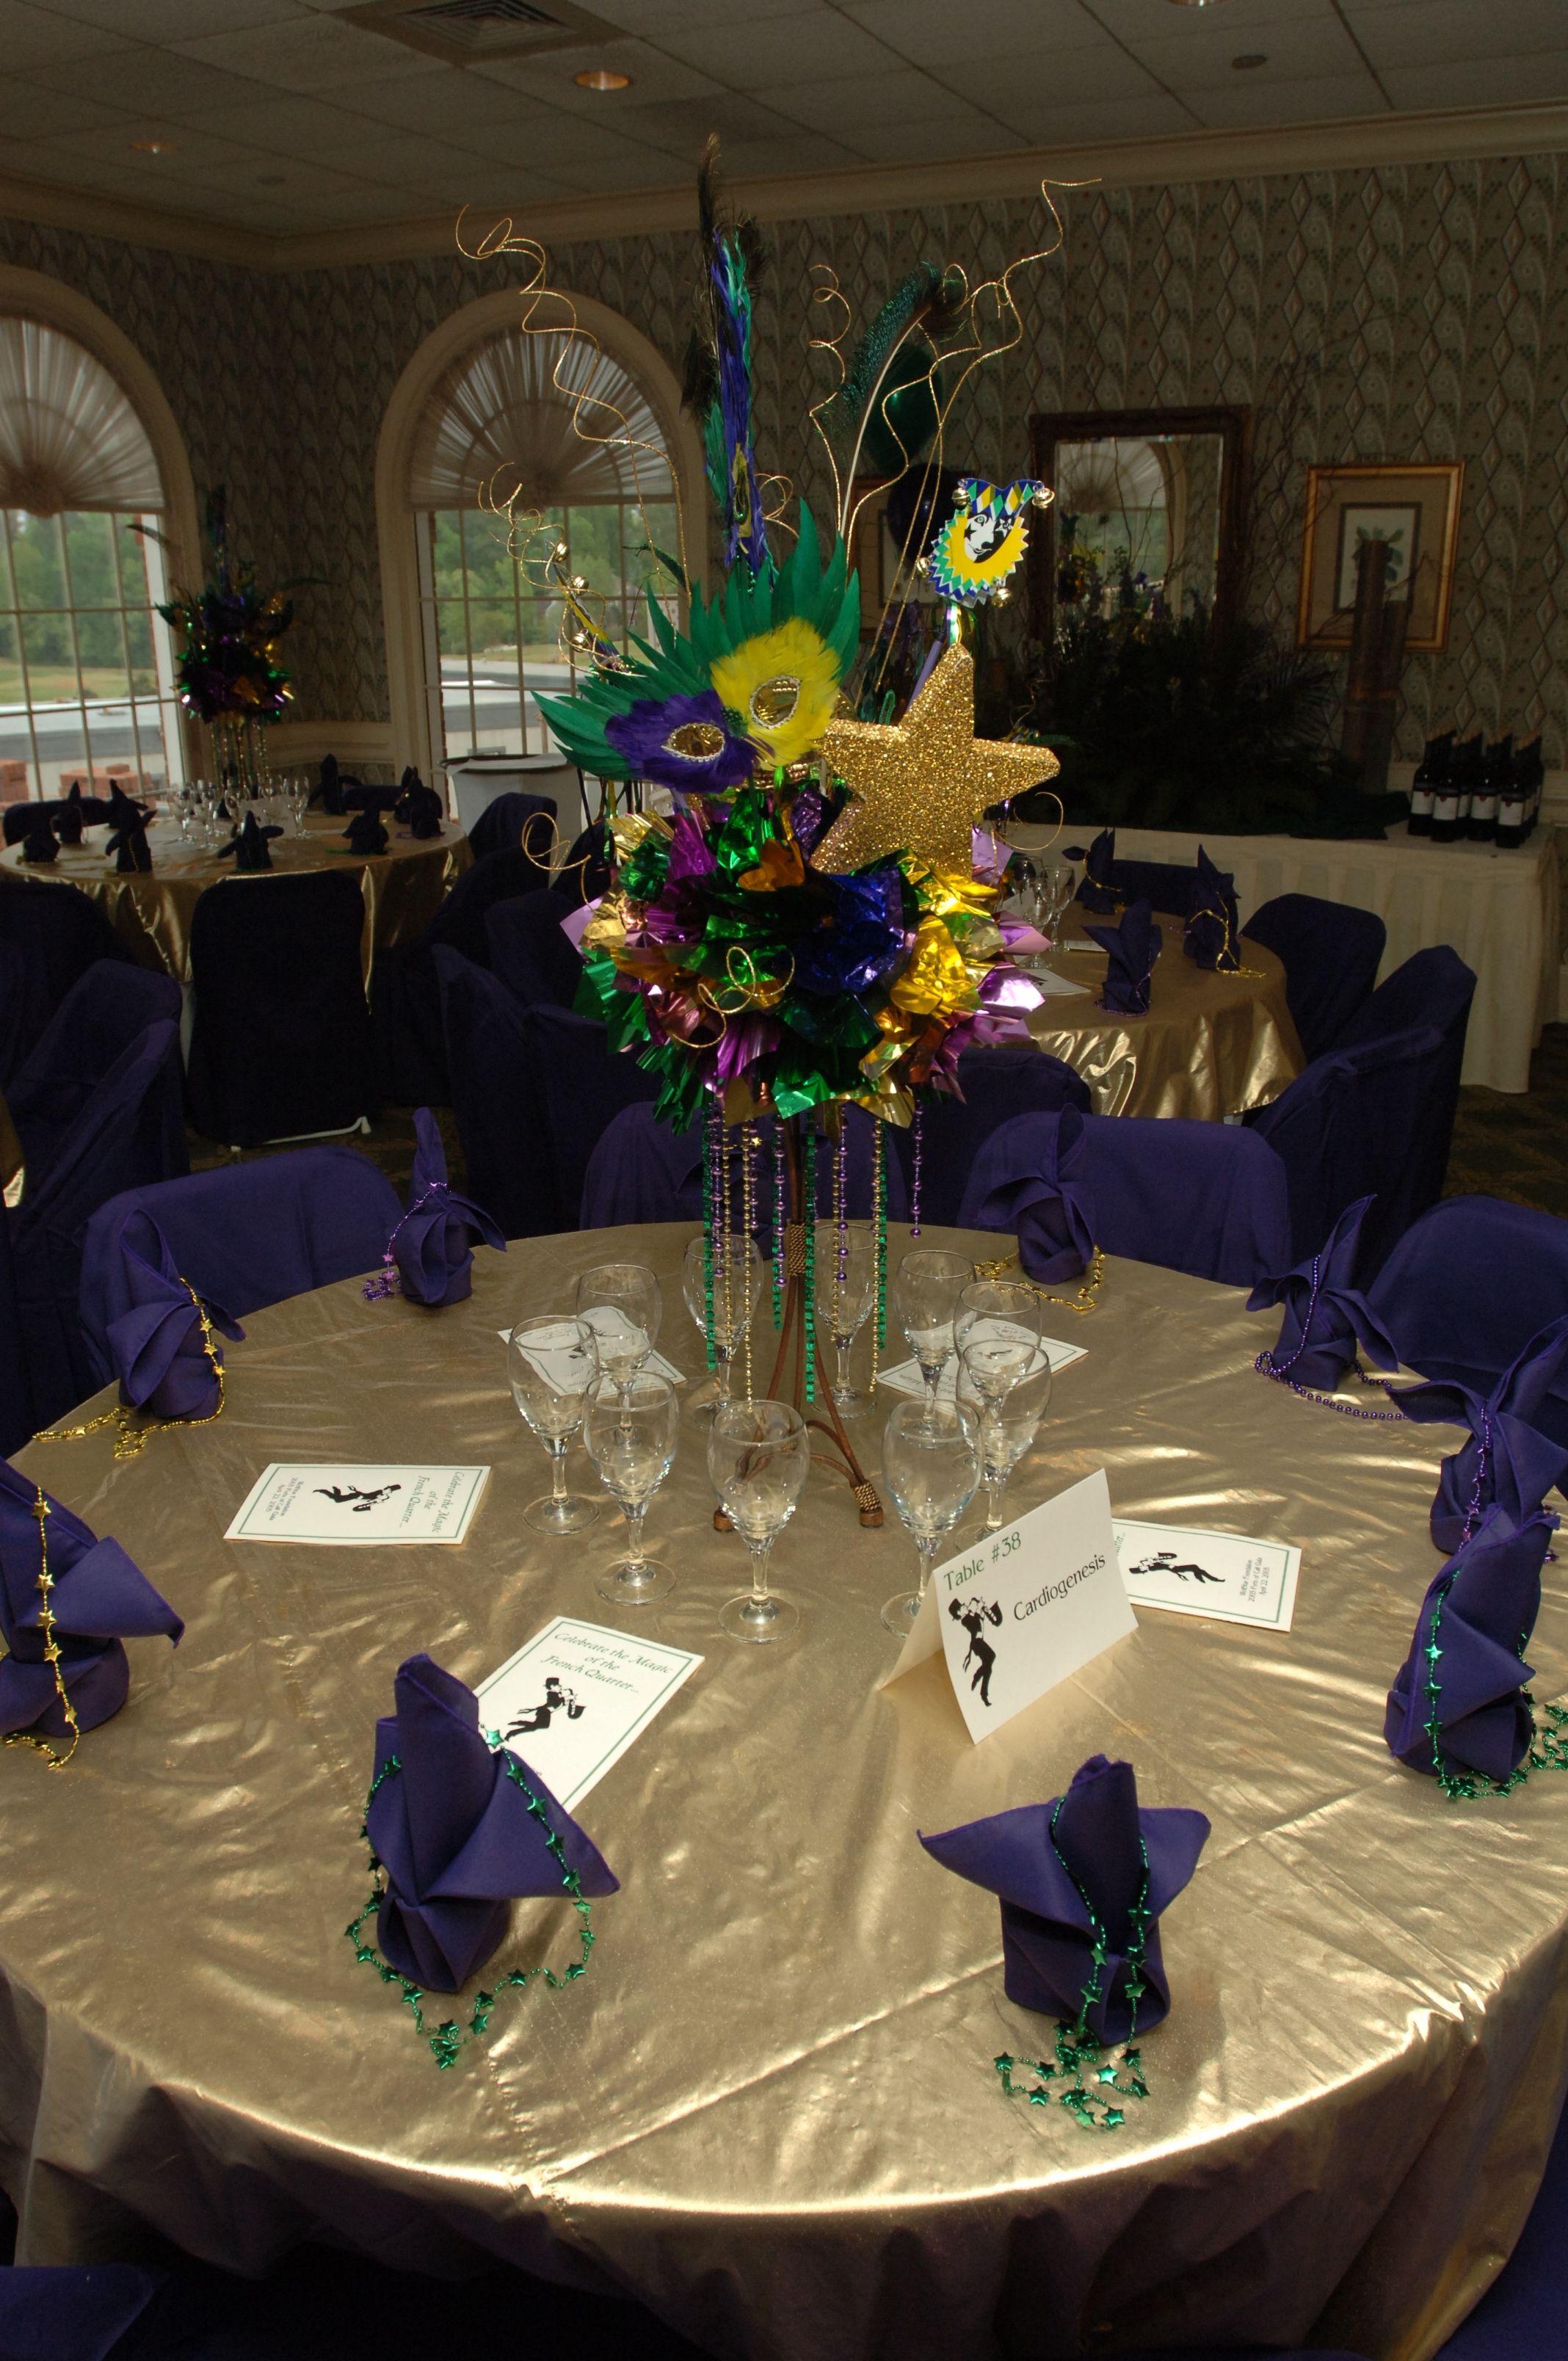 Mardi Gras Ball Decorations Mardi Gras Table Decoro'brien Productions 7704227200  Mardi